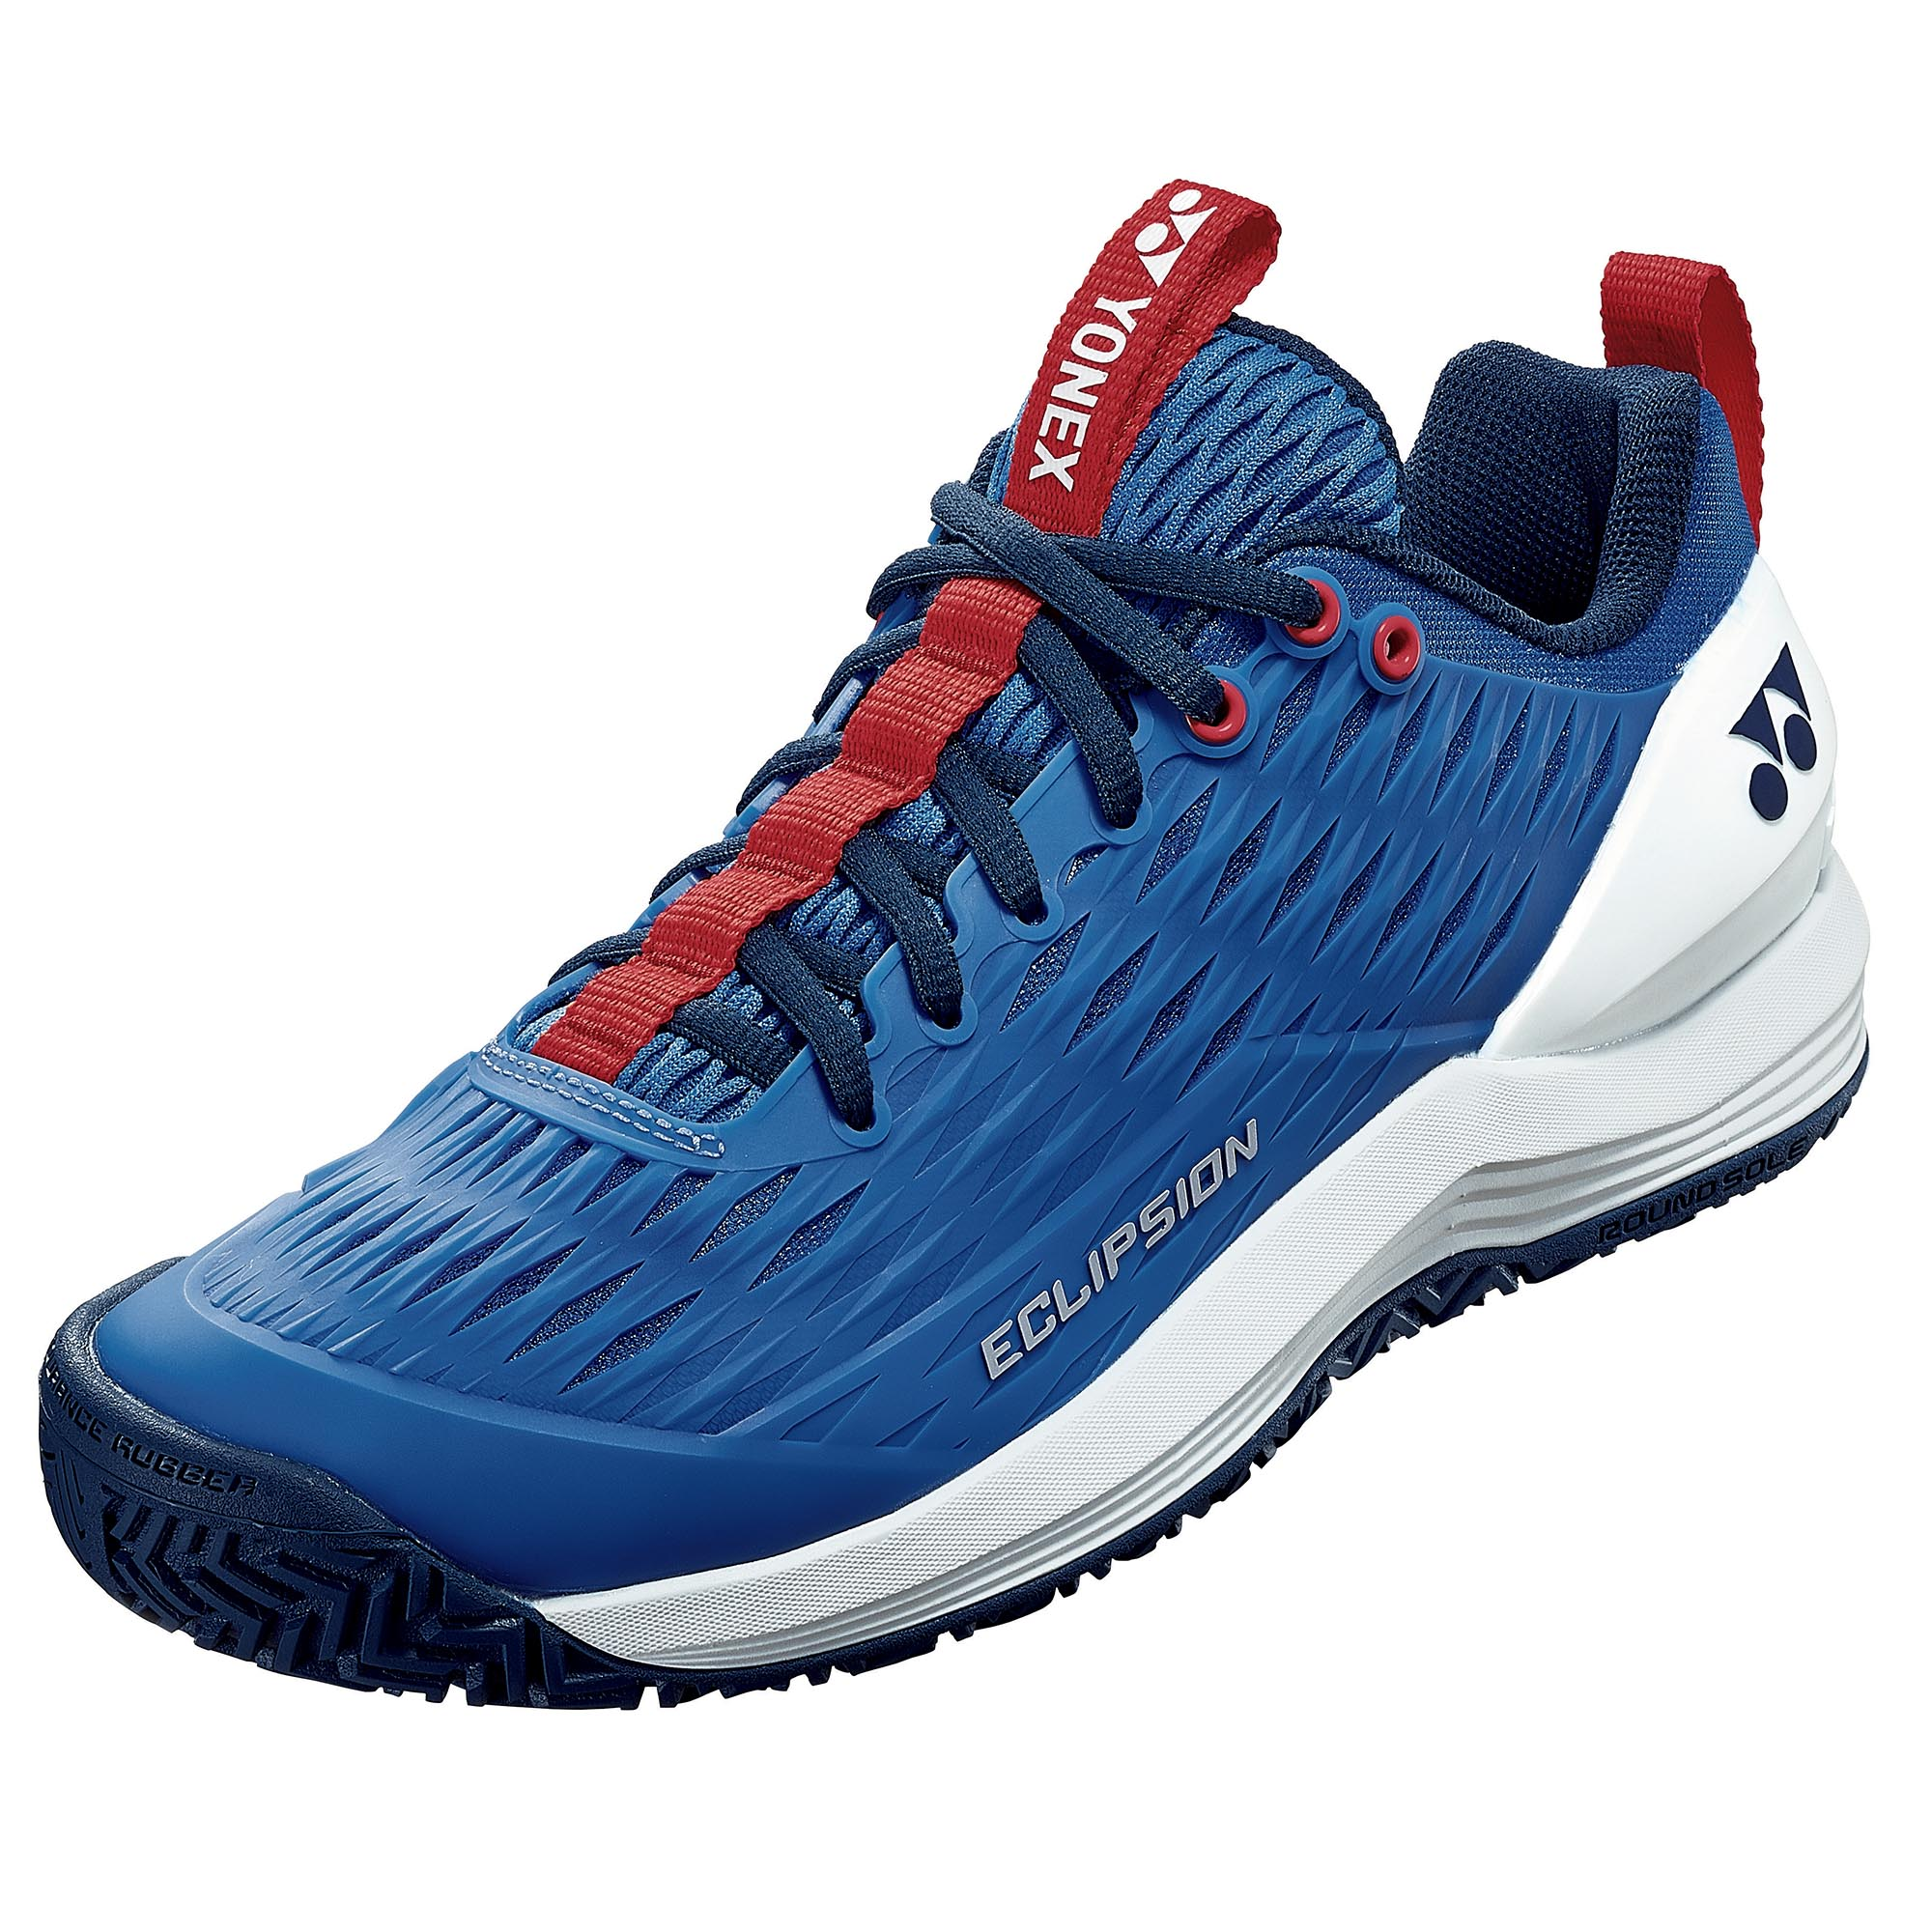 Yonex Power Cushion Eclipsion 3 Mens Tennis Shoes - Blue/White, 7.5 UK